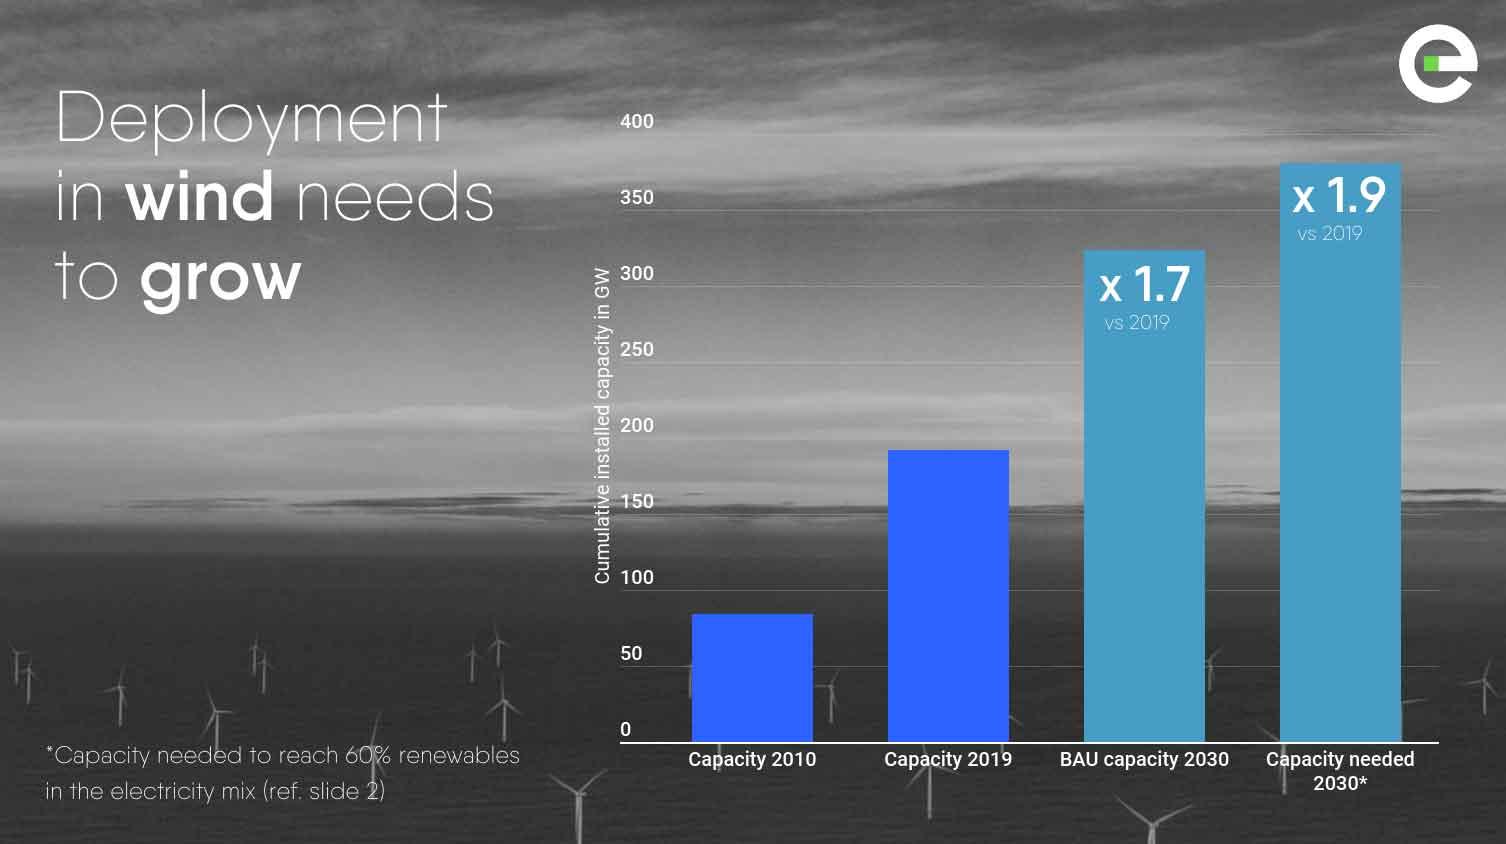 Power Barometer 2020: deployment in wind needs to grow